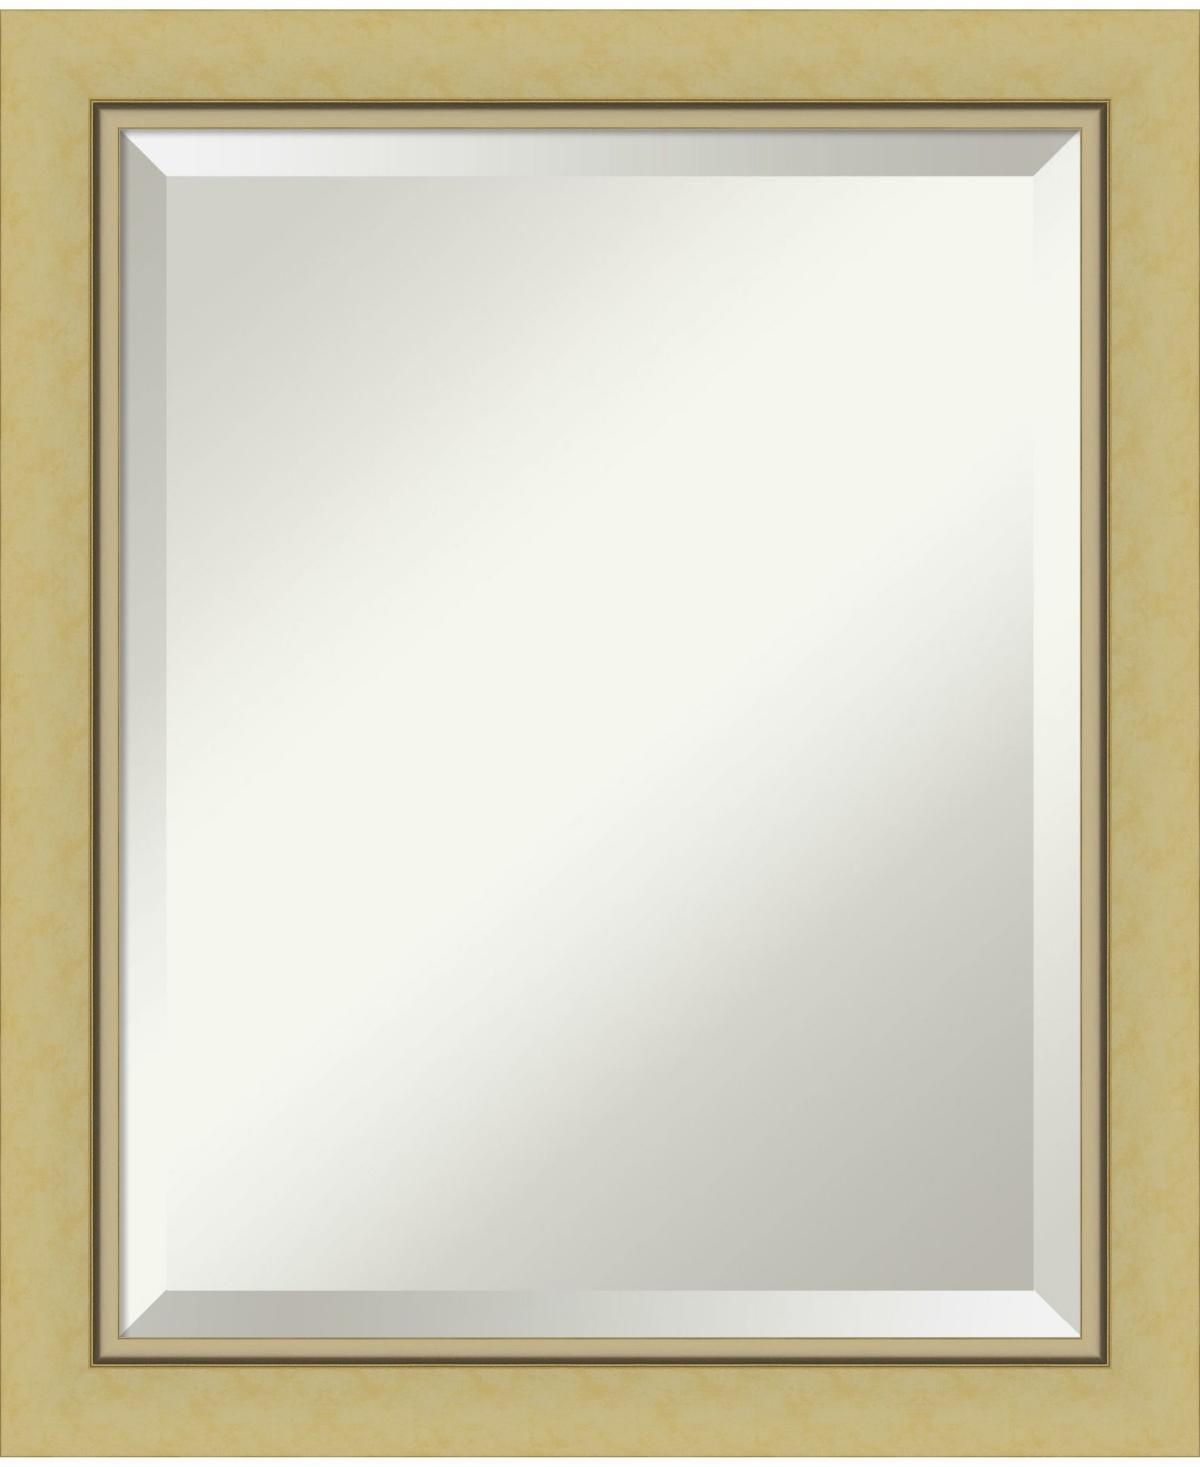 Amanti Art Landon Gold-tone Framed Bathroom Vanity Wall Mirror, 19.38